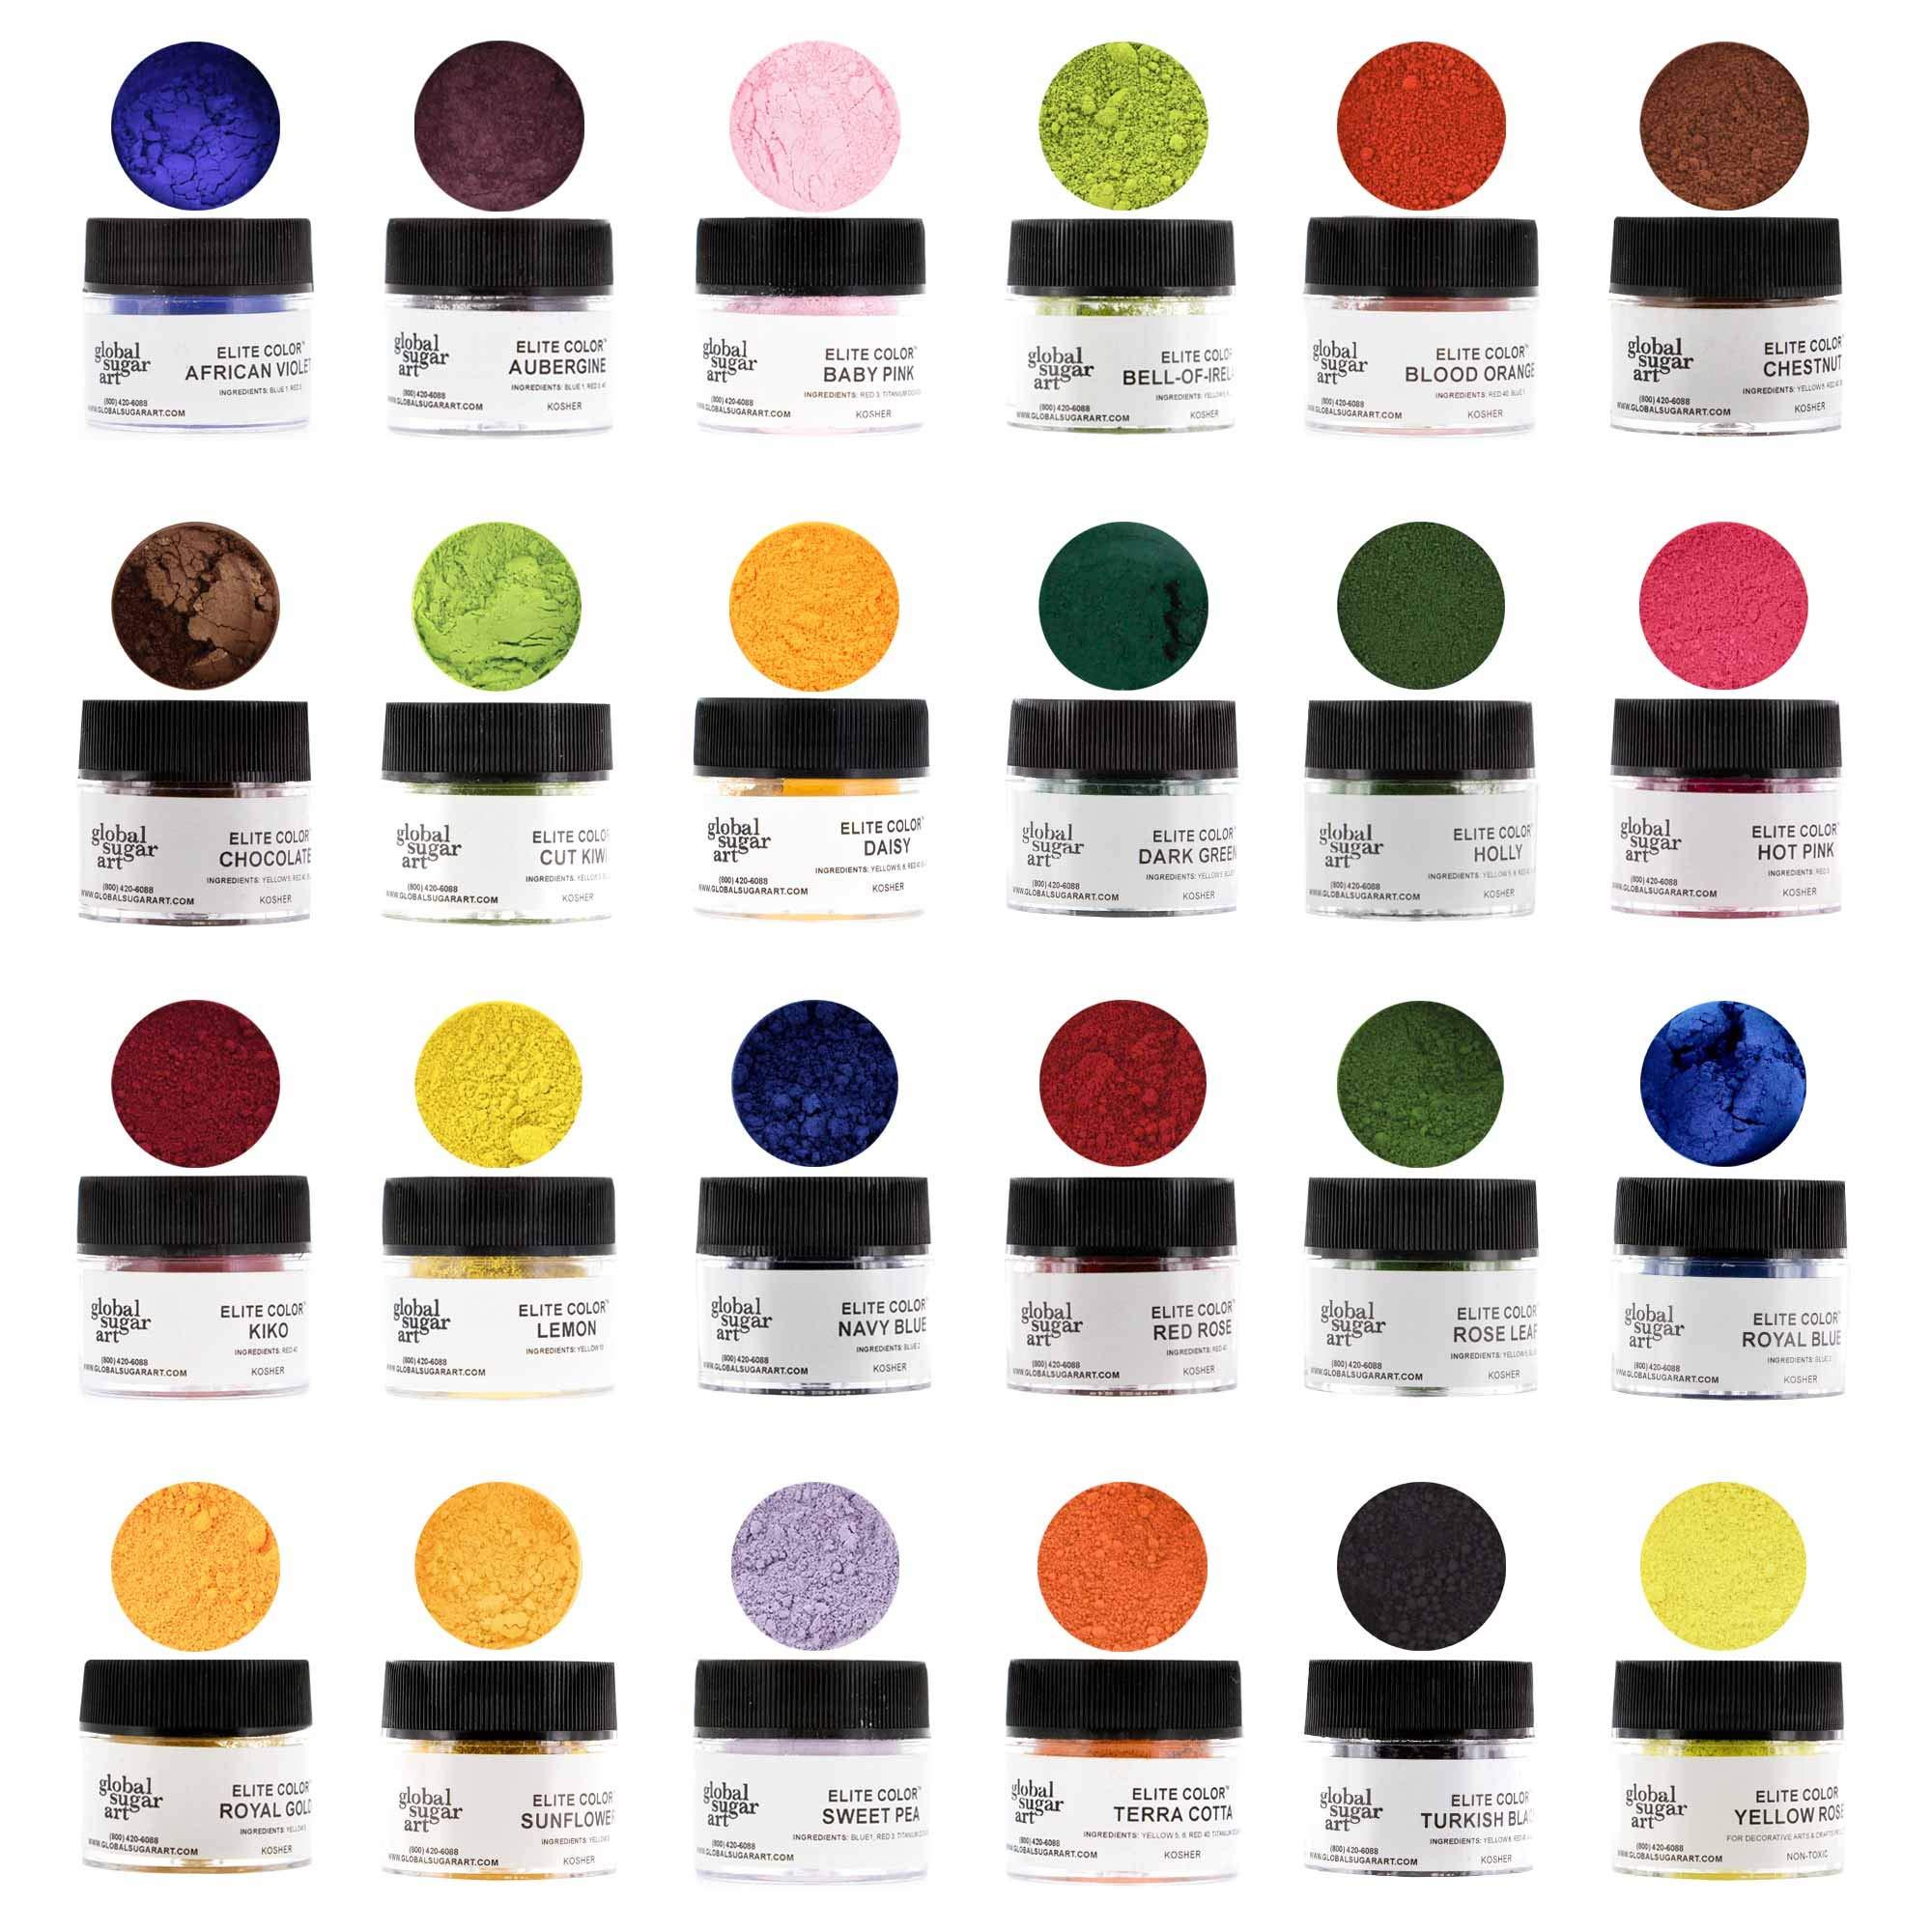 Master Premium Petal Dust Kit, 24 Color by Global Sugar Art by Global Sugar Art (Image #1)